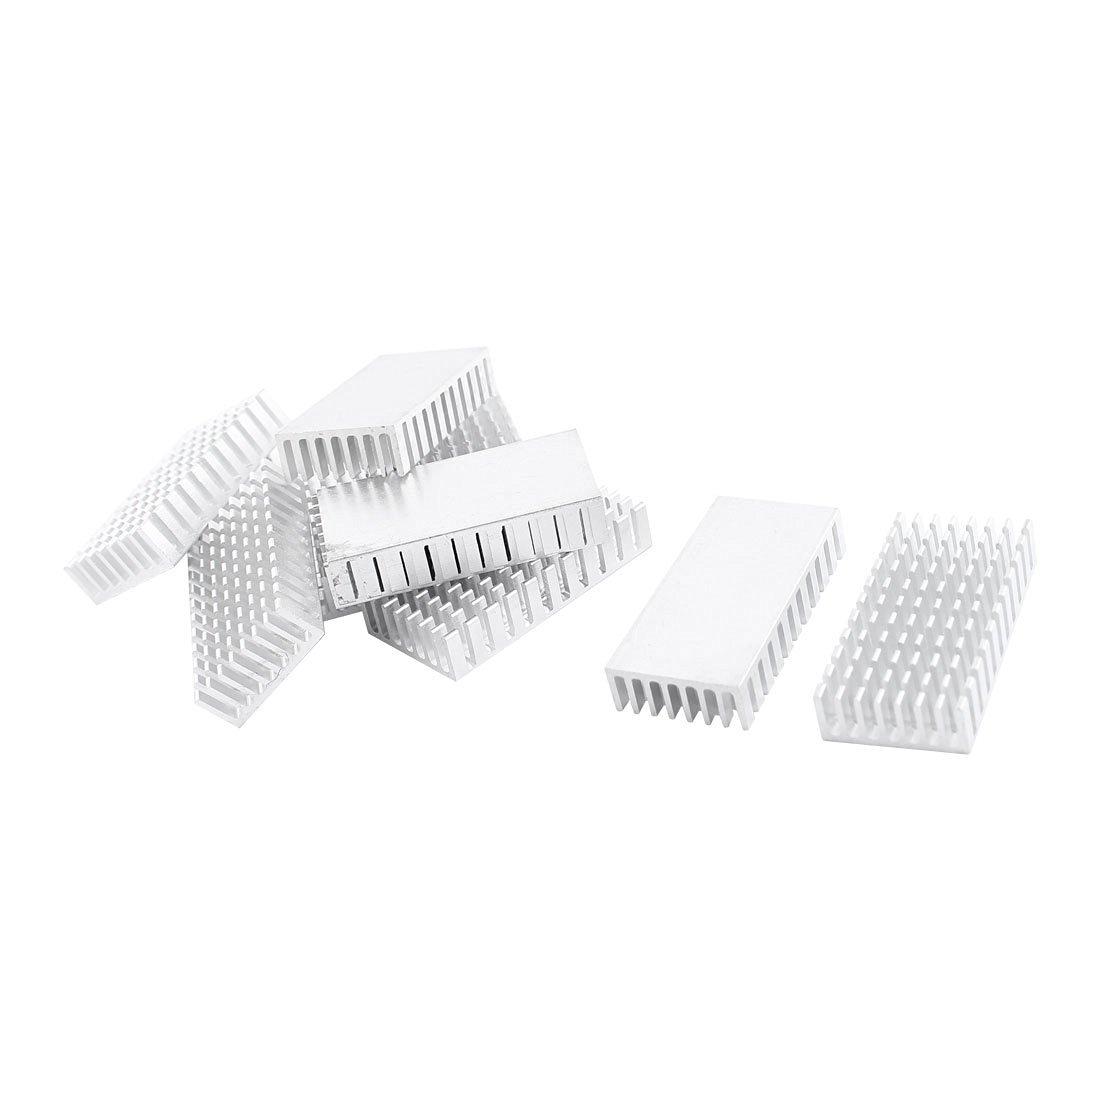 10 Pcs Silver Tone Aluminium VGA CPU Heatsink Heat Sink 10x50x25mm